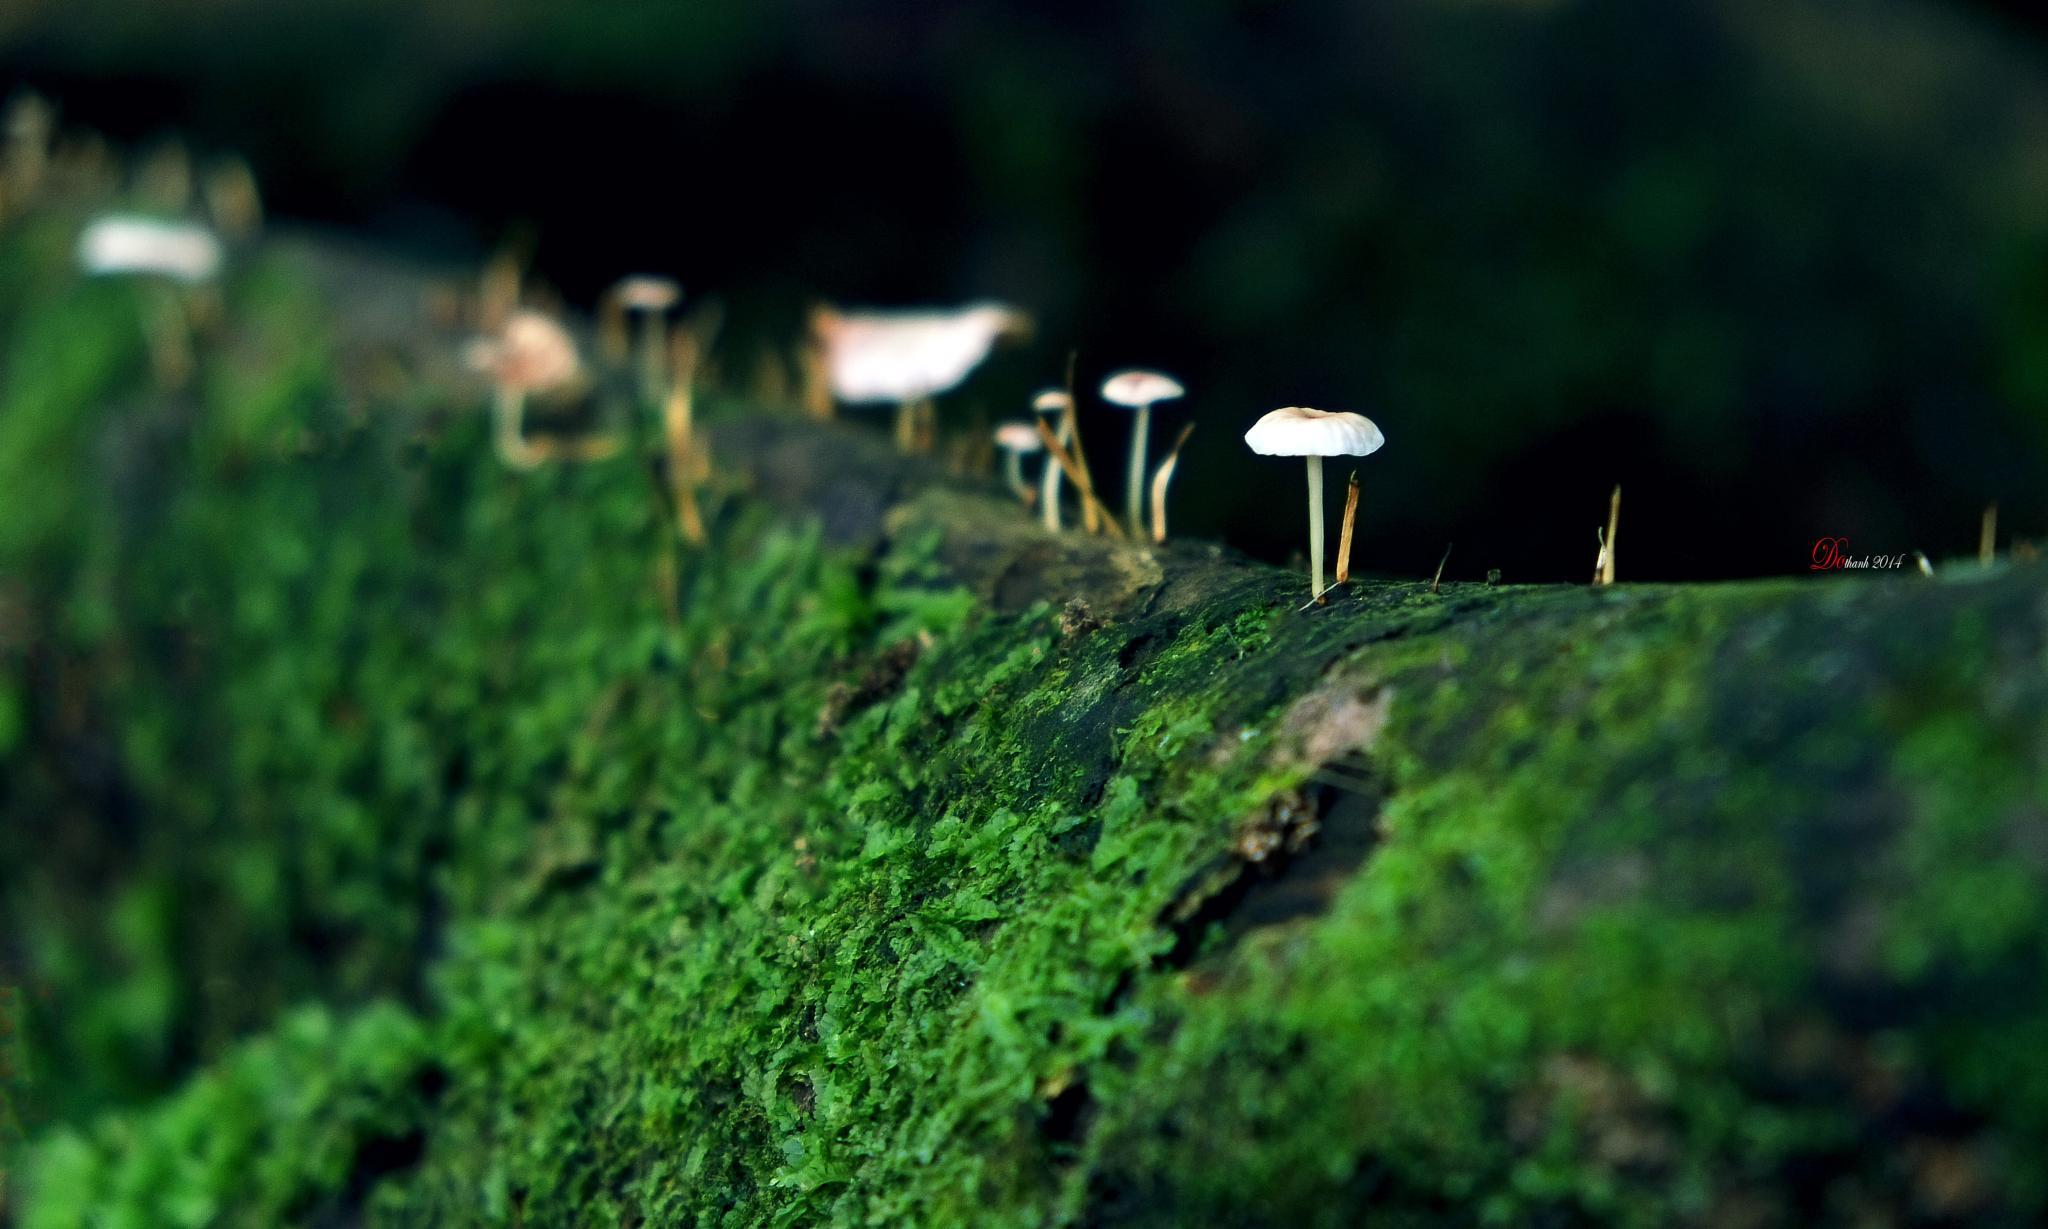 beautiful mushrooms by Do Thanh - NgoNgo